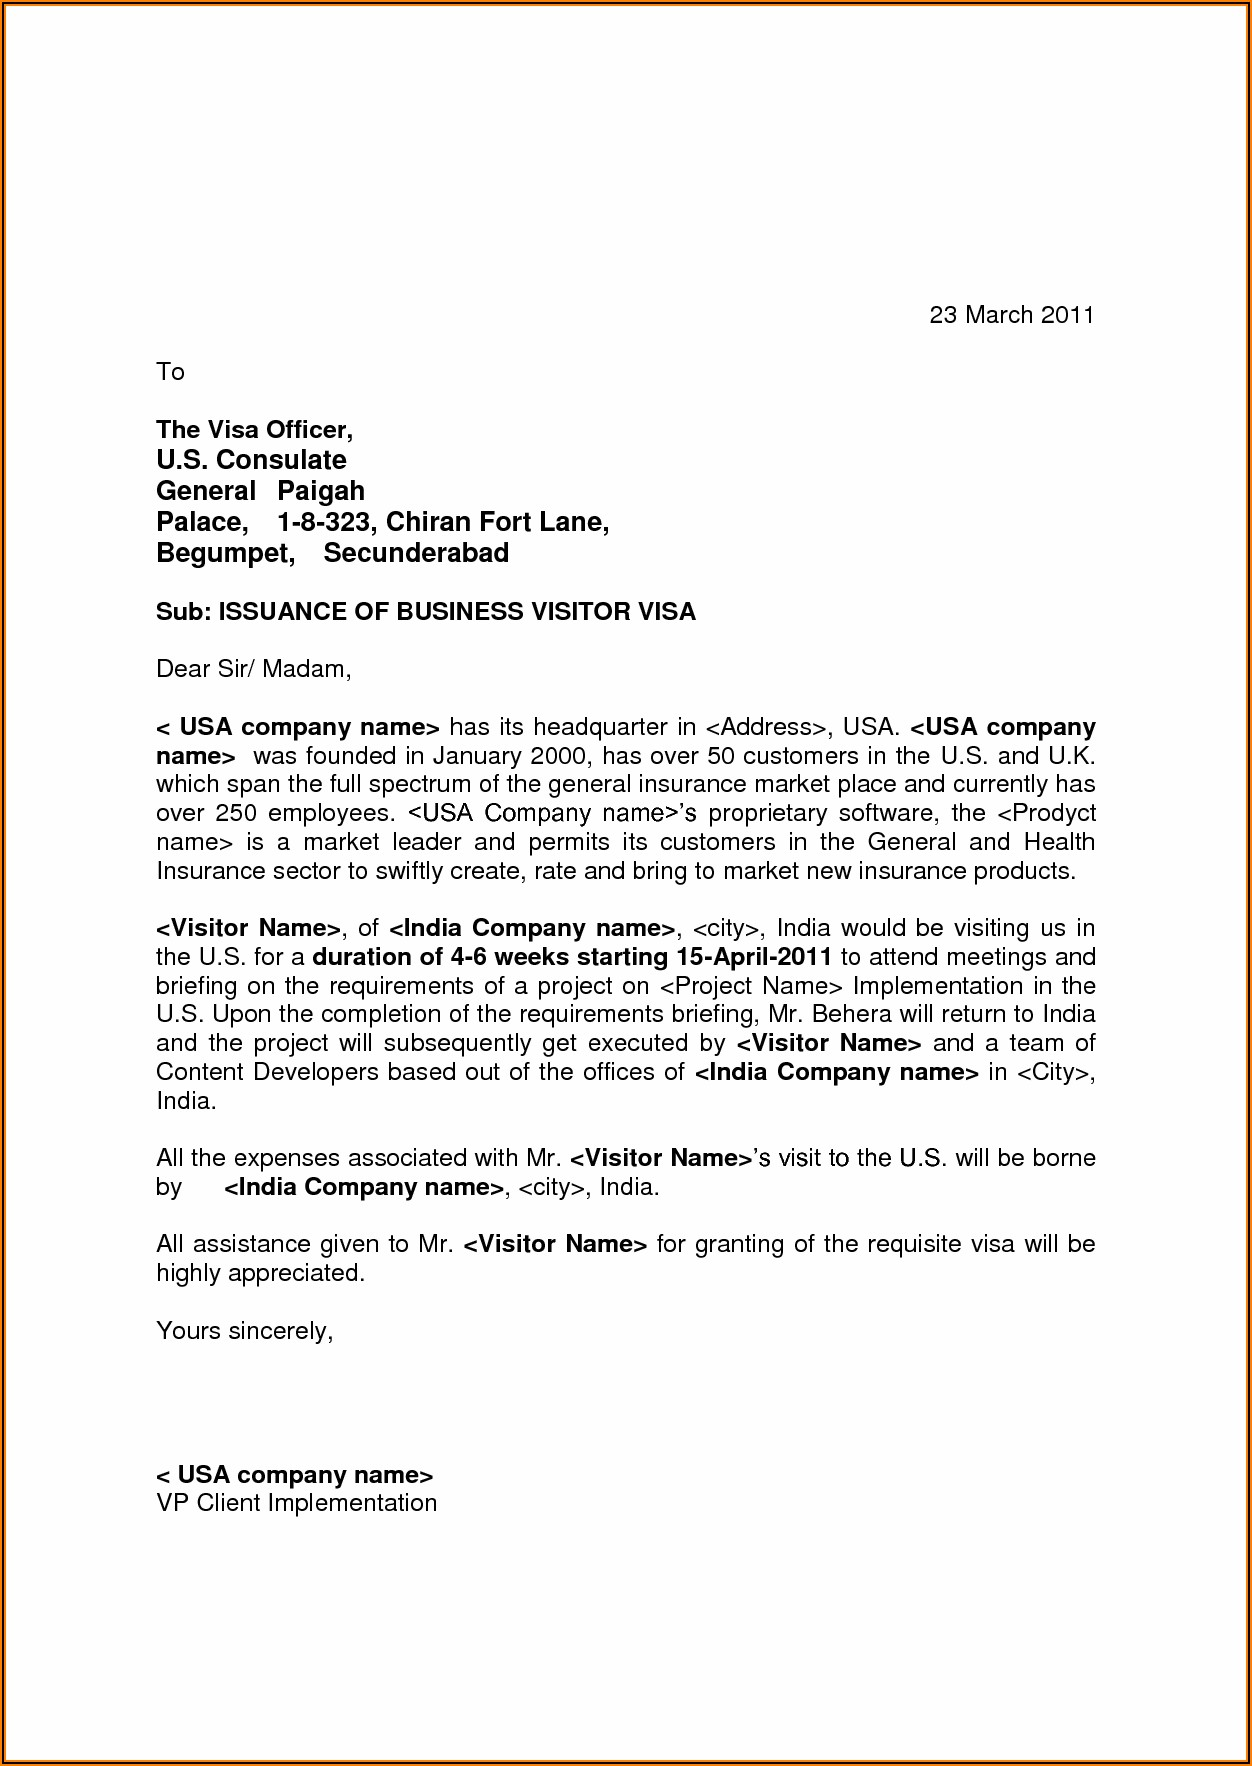 Visa Invitation Letter Sample